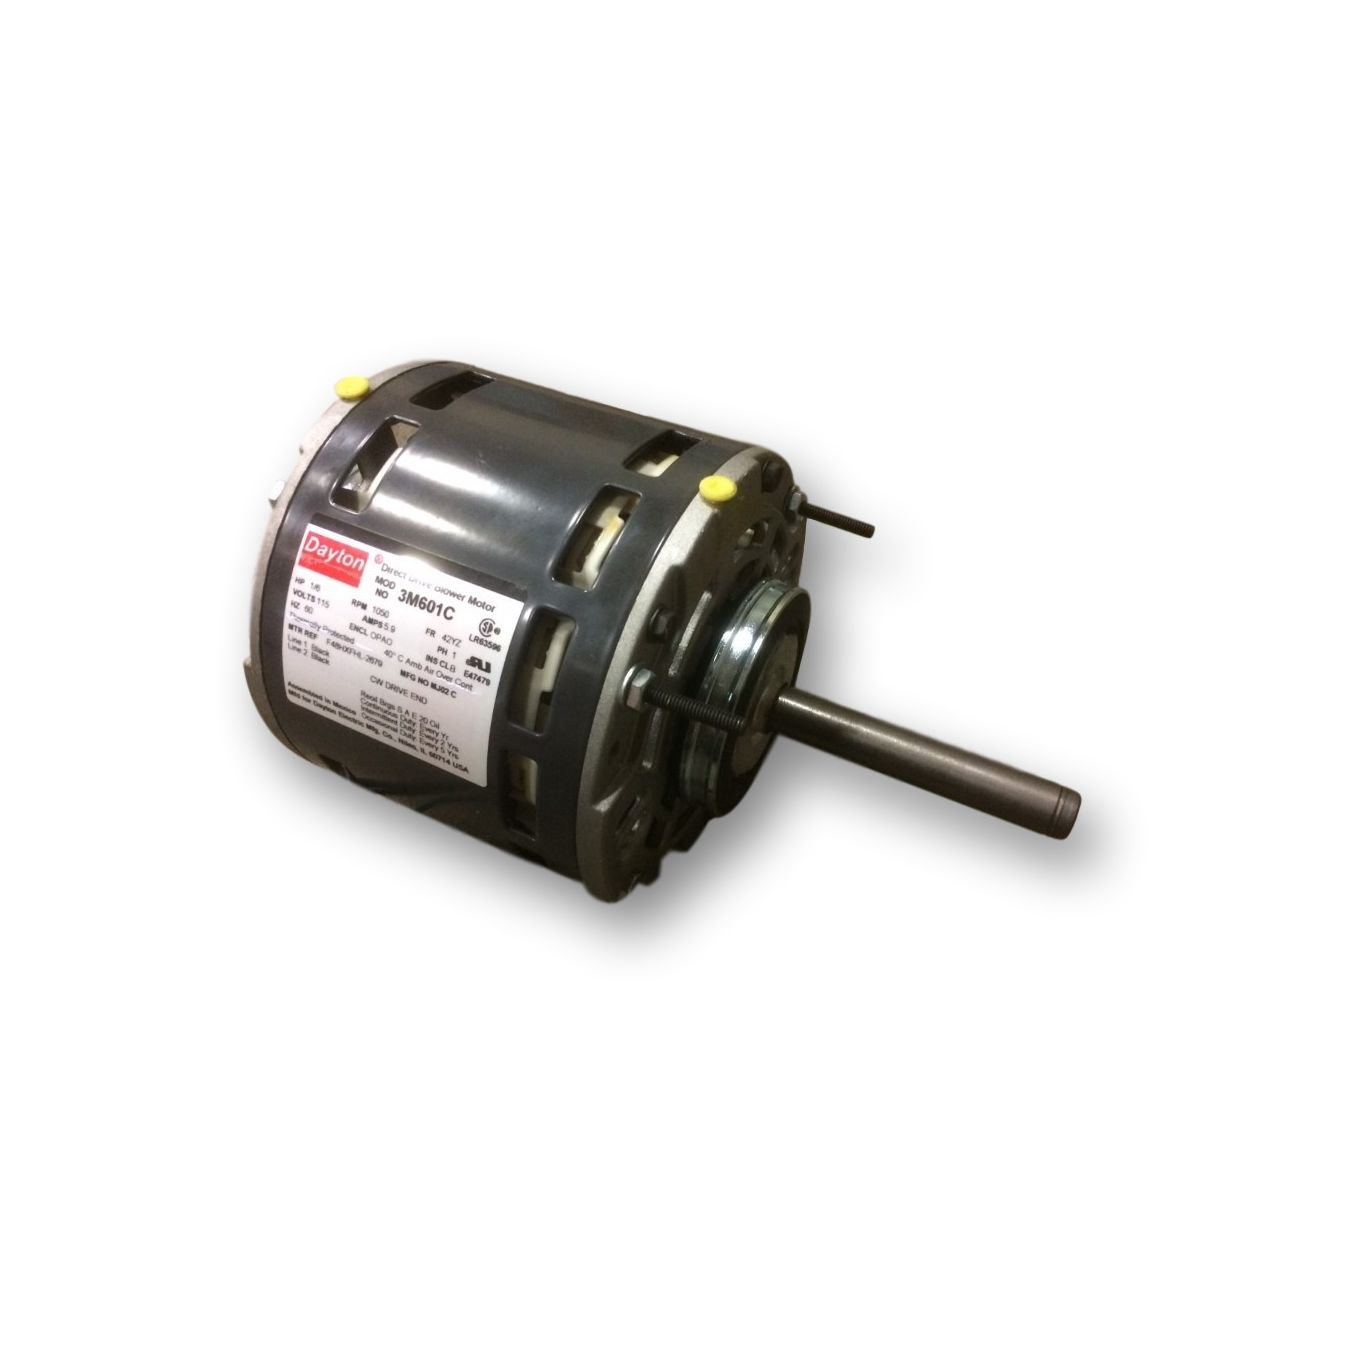 Dayton Direct Drive Fan Motor : Hp dayton m c direct drive blower motor yz frame